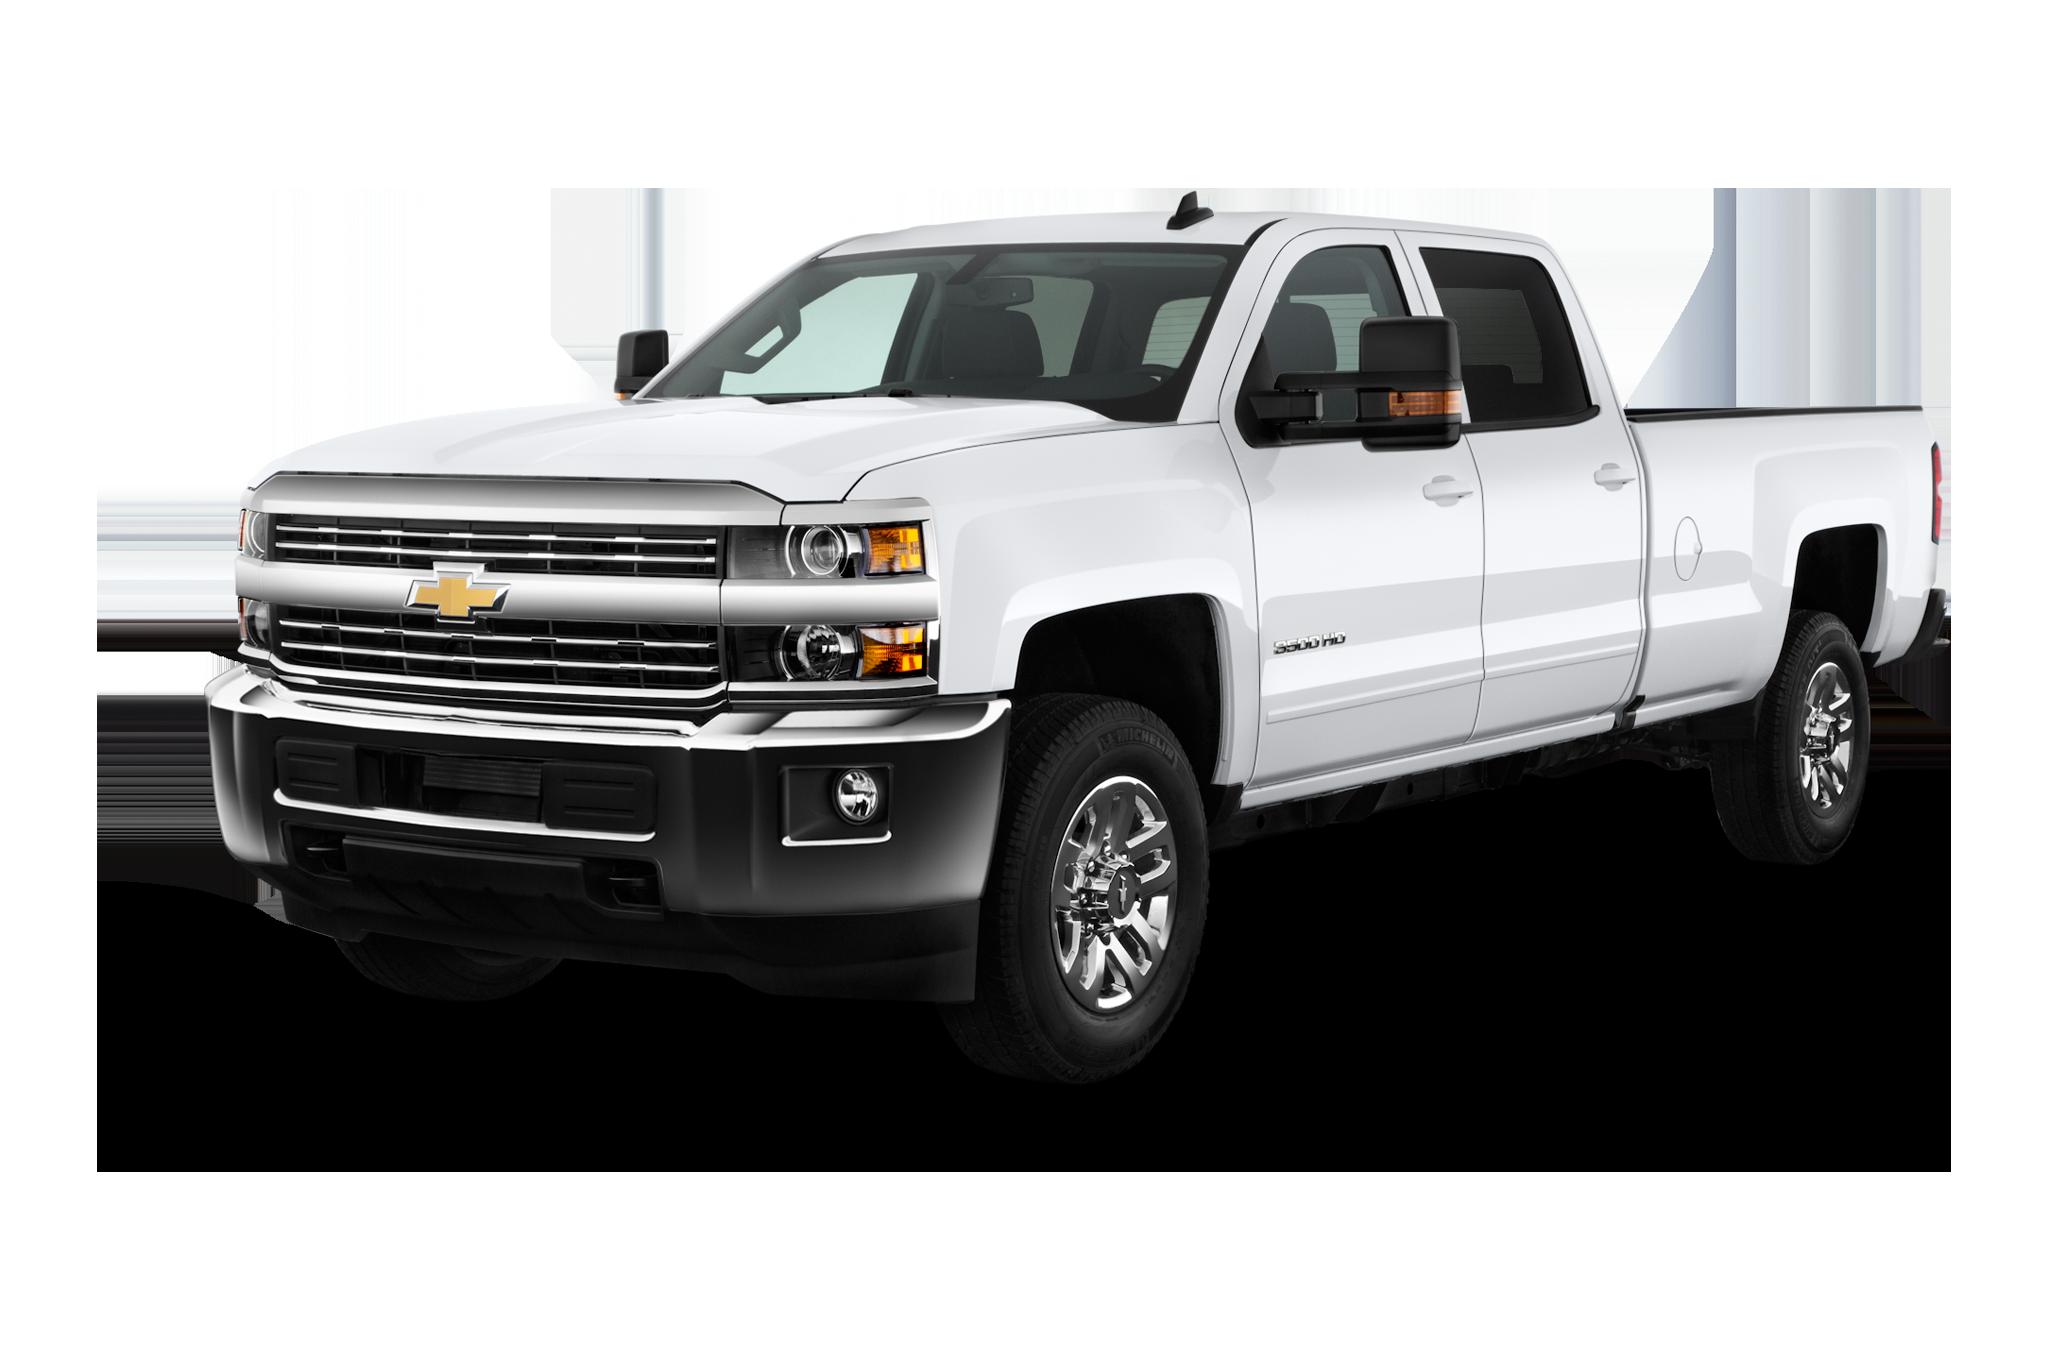 2018 chevrolet silverado 3500hd work truck 4wd crew cab. Black Bedroom Furniture Sets. Home Design Ideas